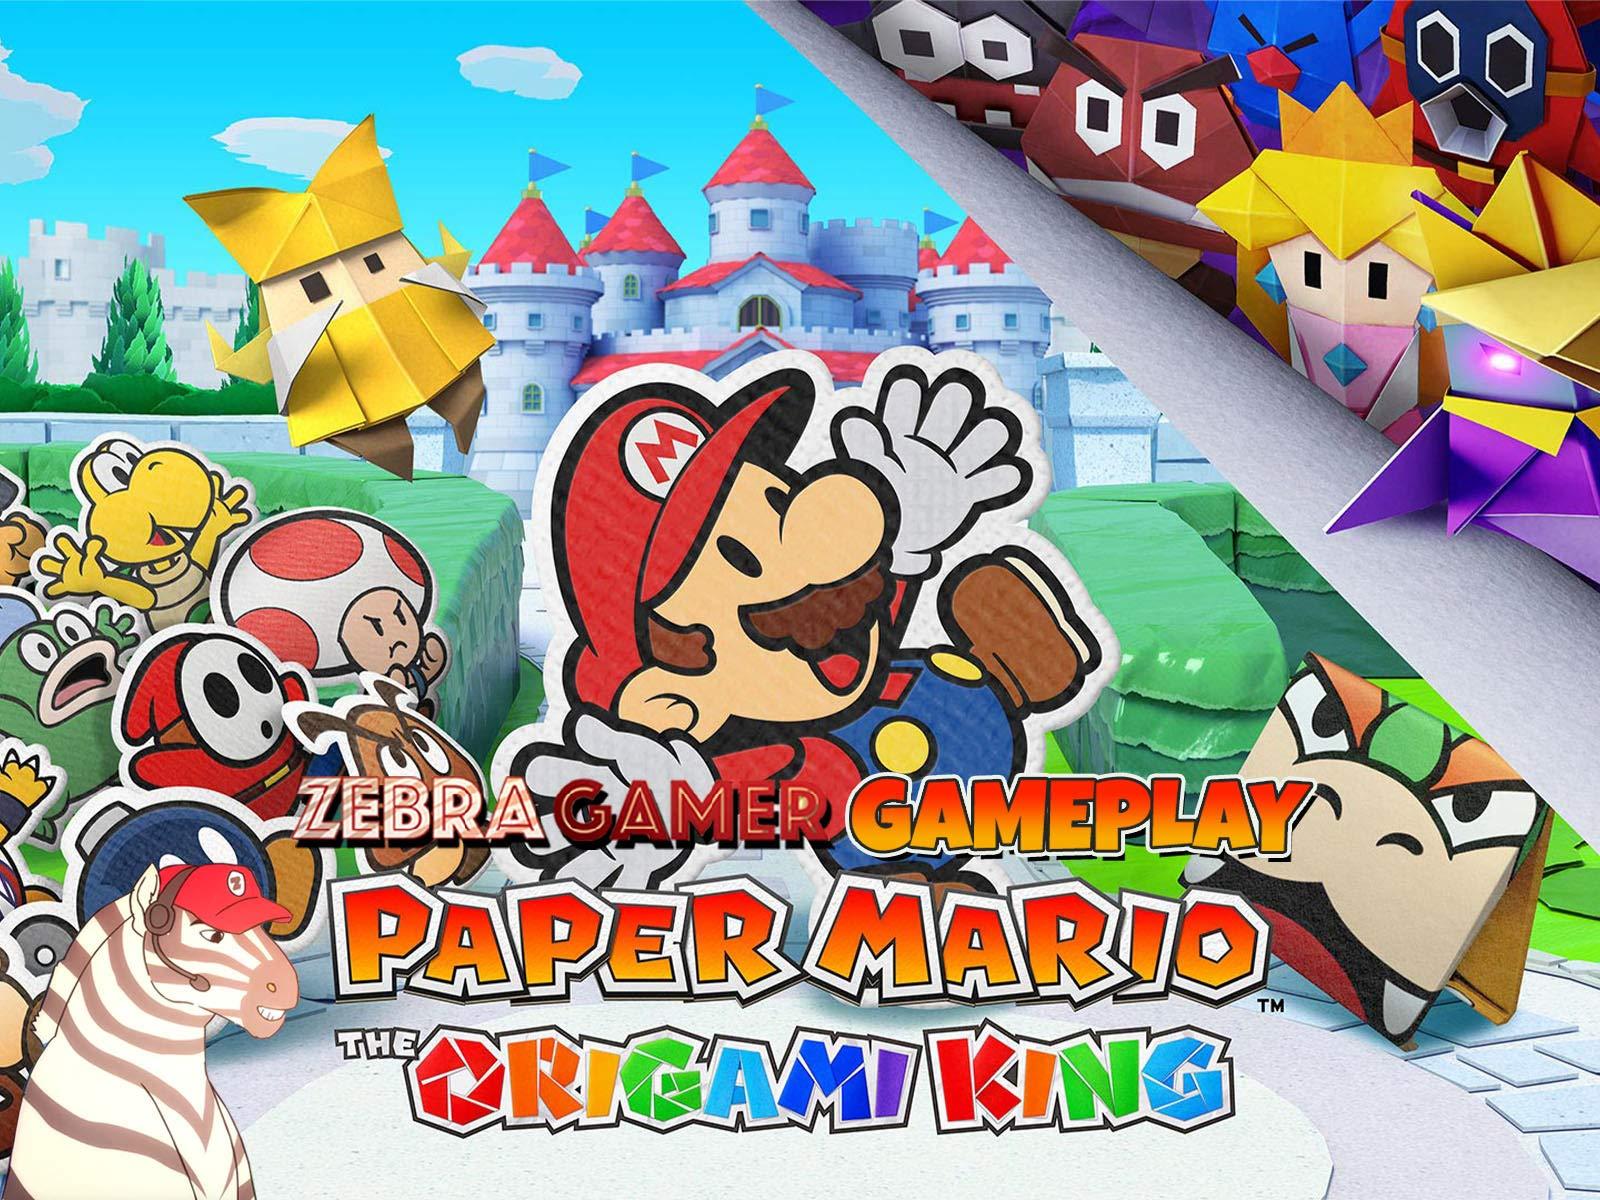 Clip: Paper Mario The Origami King Gameplay - Zebra Gamer - Season 1